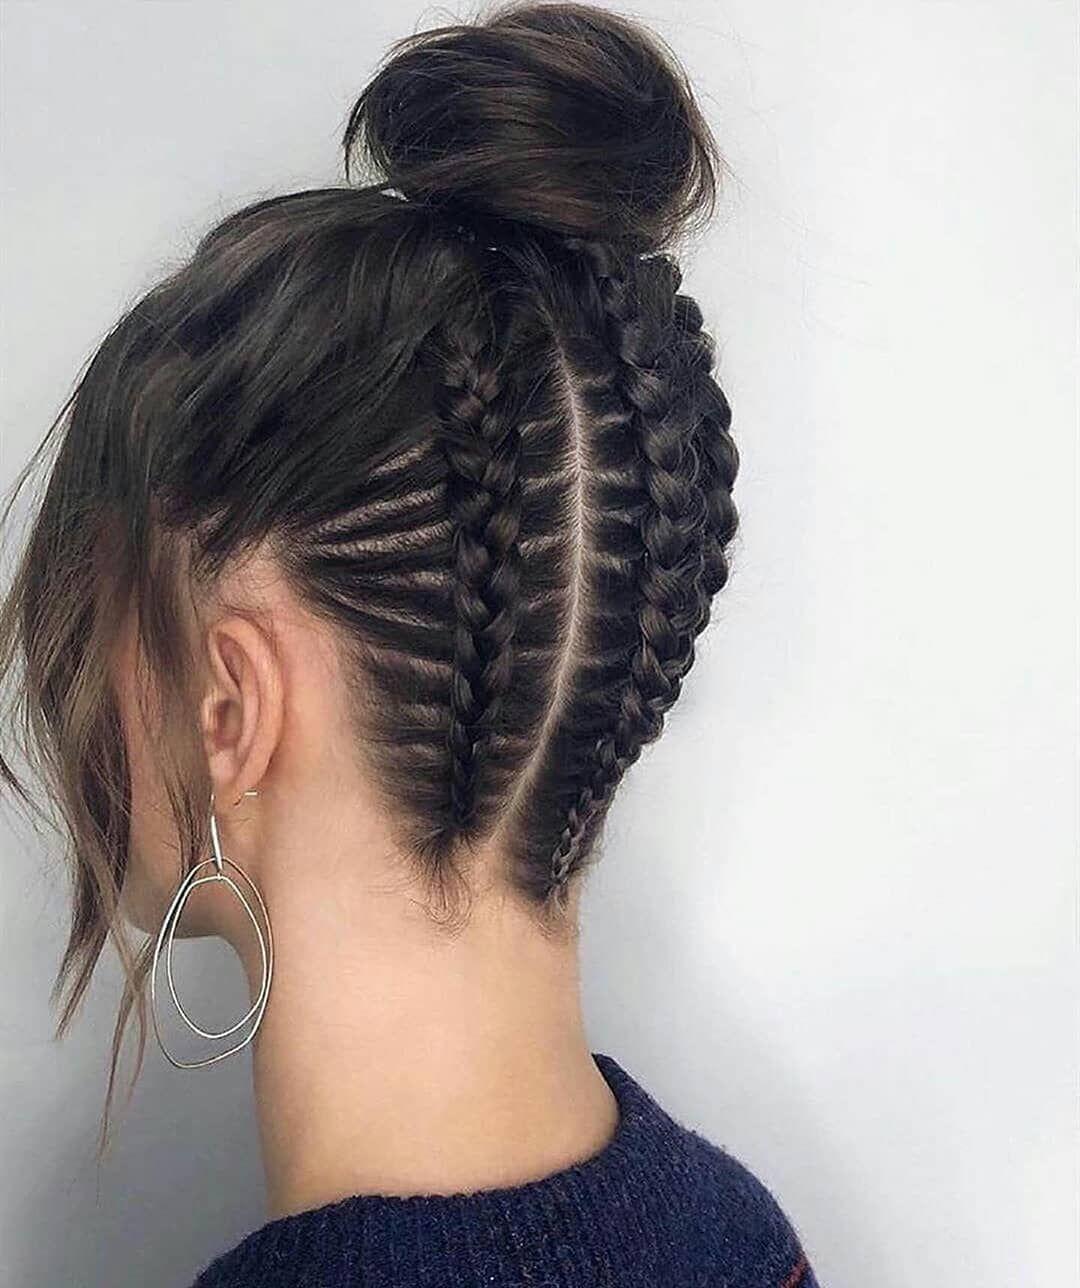 Braided Hairstyles Using Braided Hairstyles Cute Braided Hairstyles For Kenyan Ladies Braided Hairstyle In 2020 Braided Hairstyles Braids For Long Hair Hair Styles